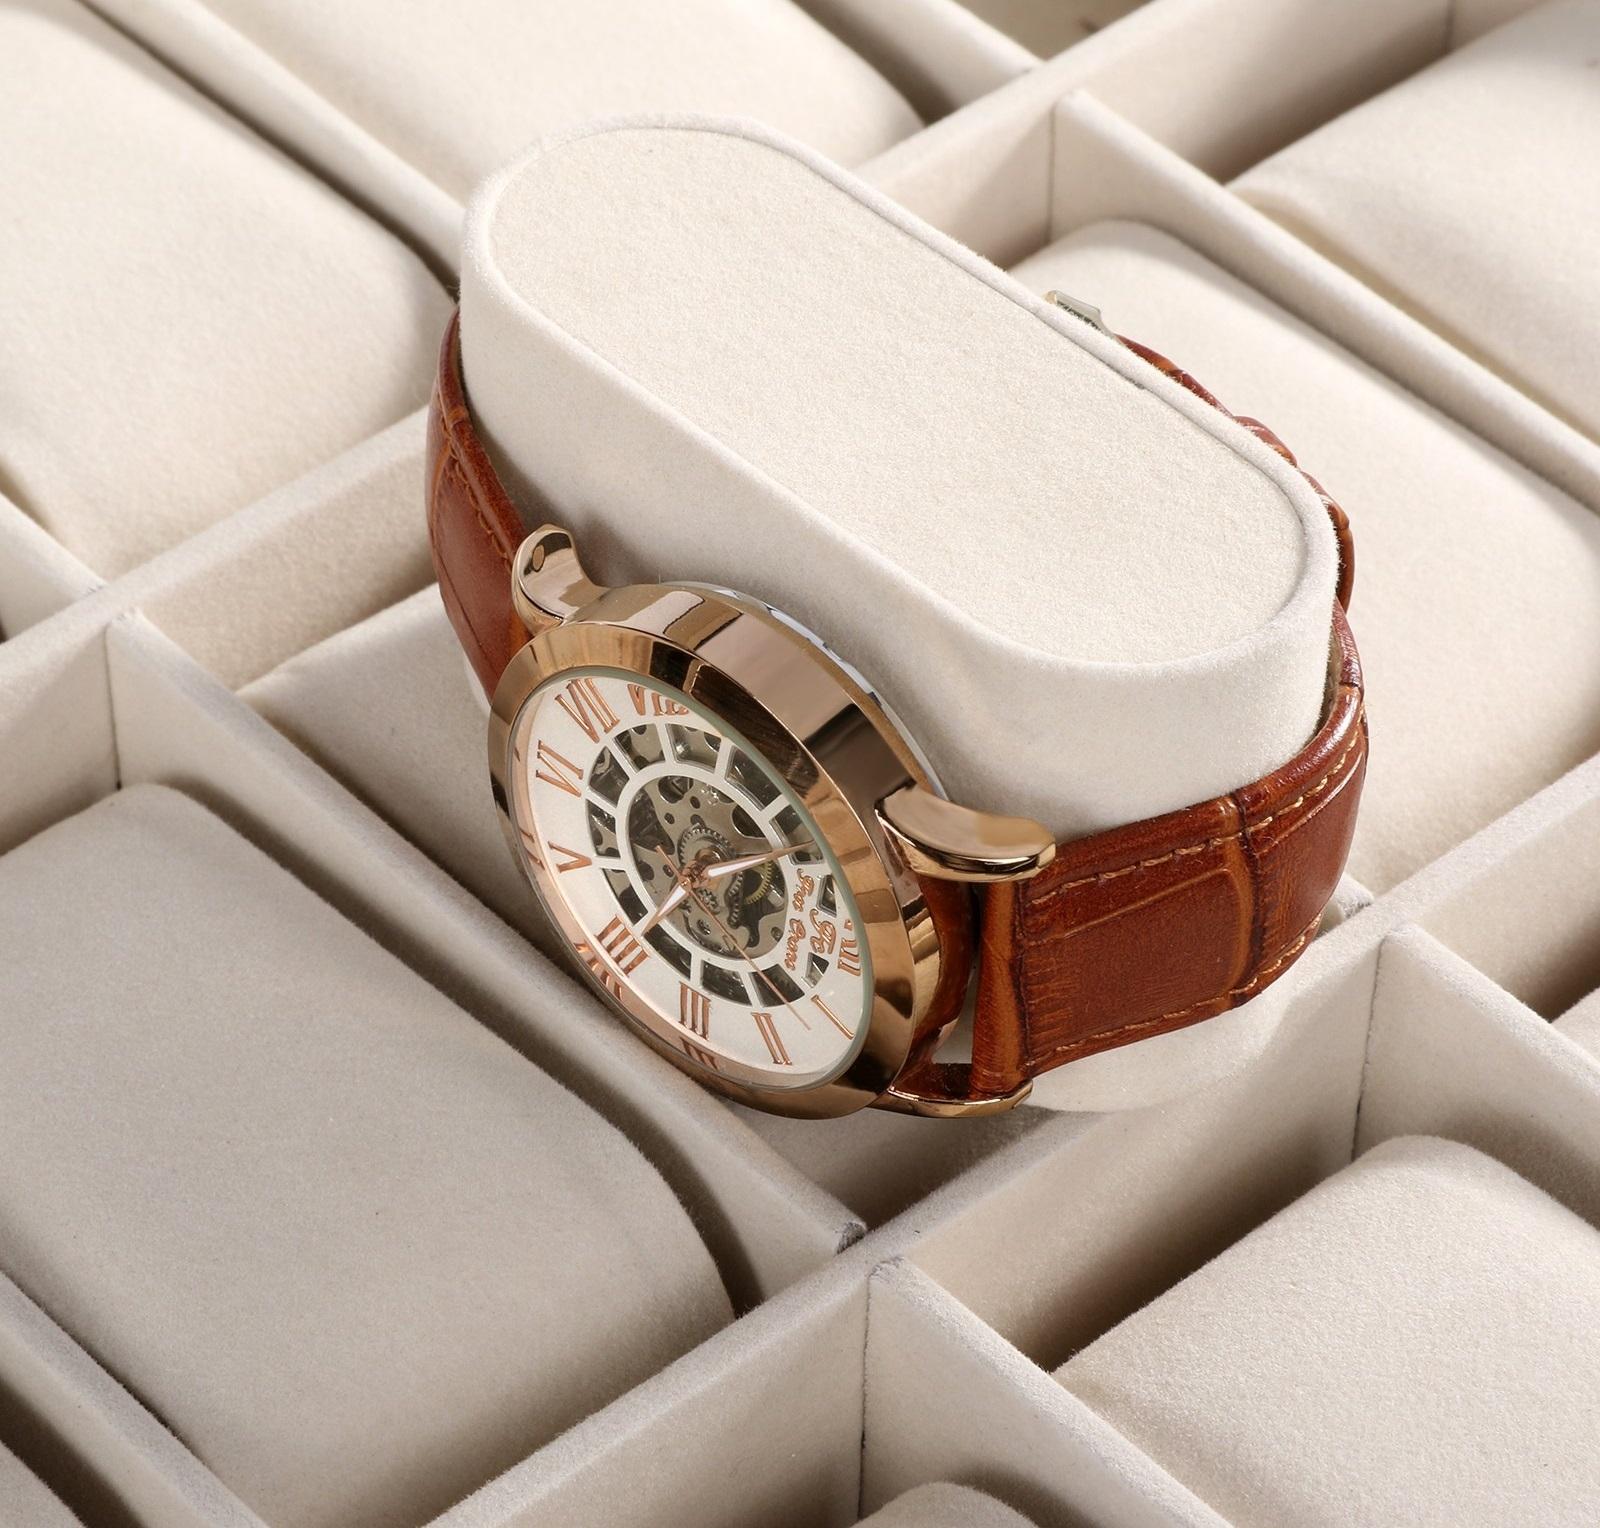 Caja 12 Relojes Cuero Stain.